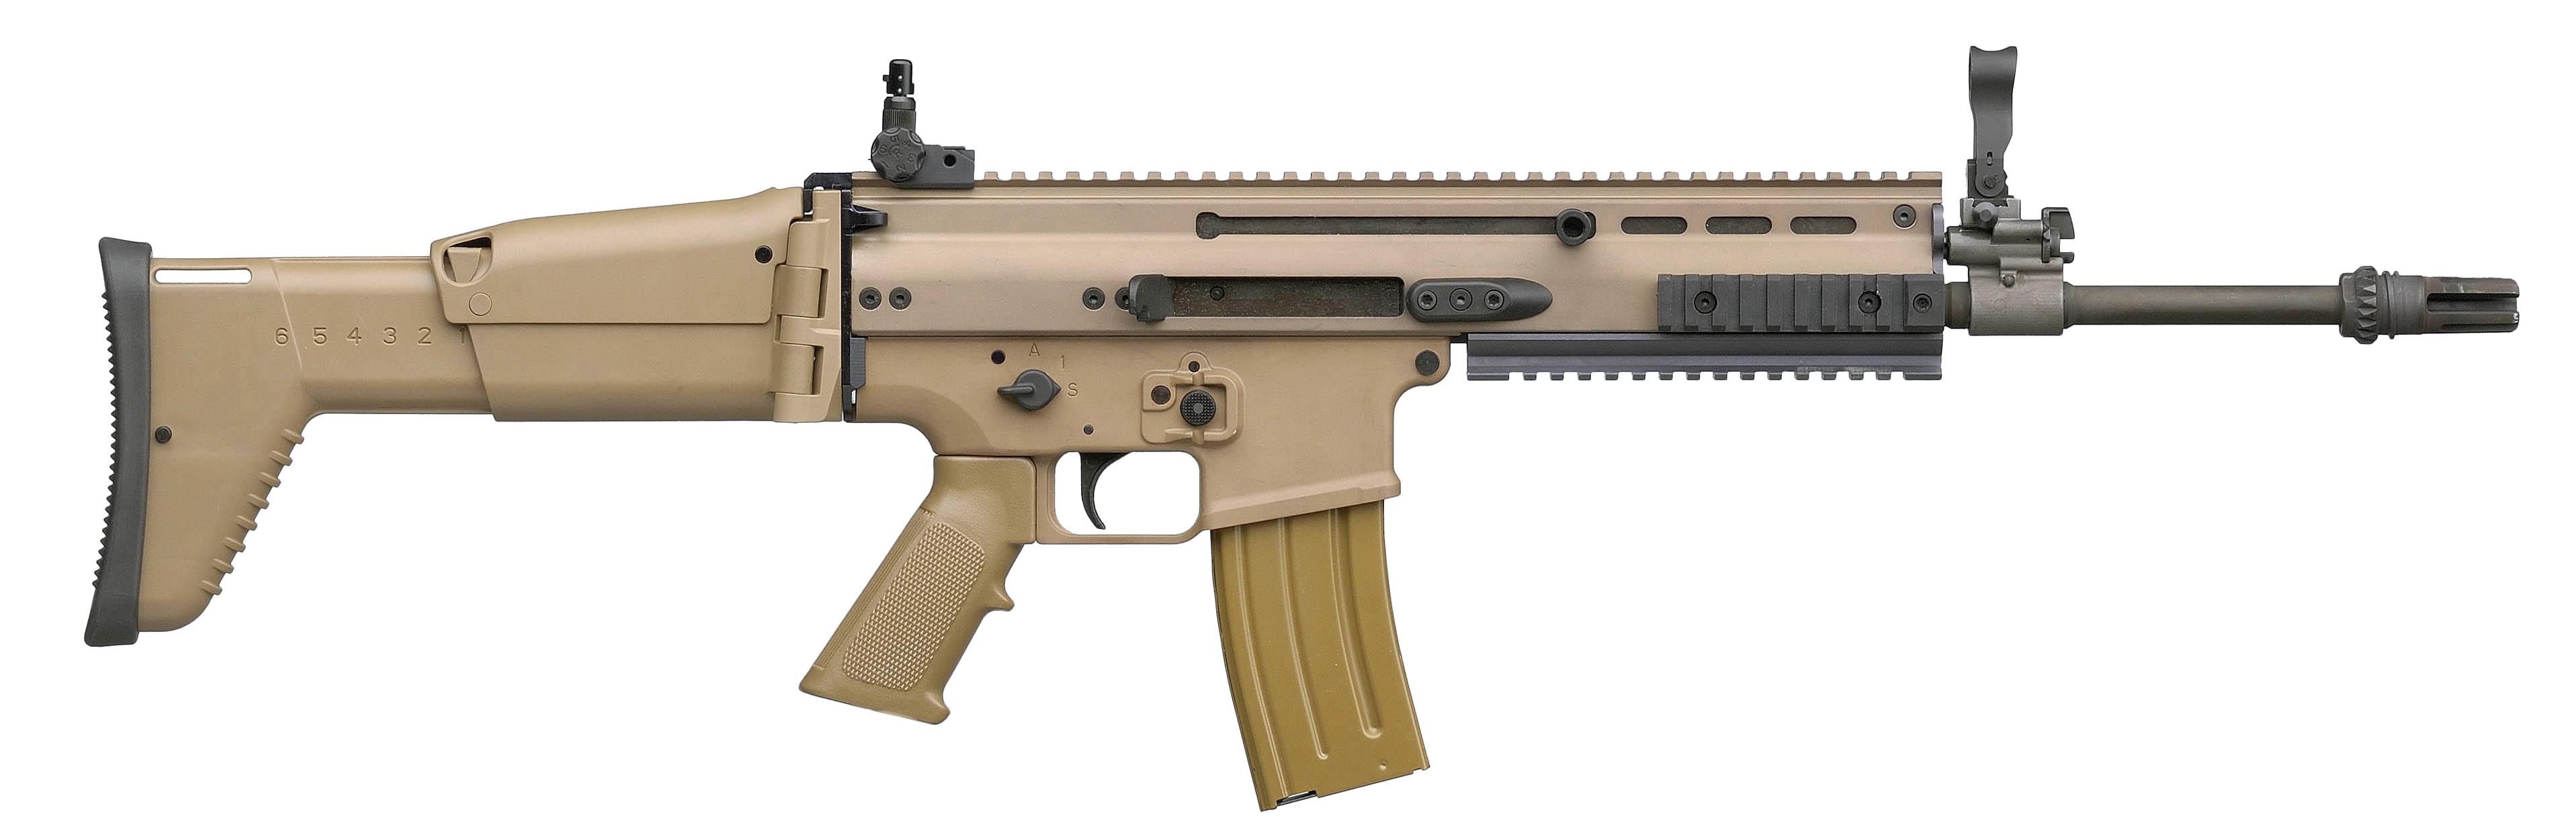 Classic Dust Assault Rifle PNG Image